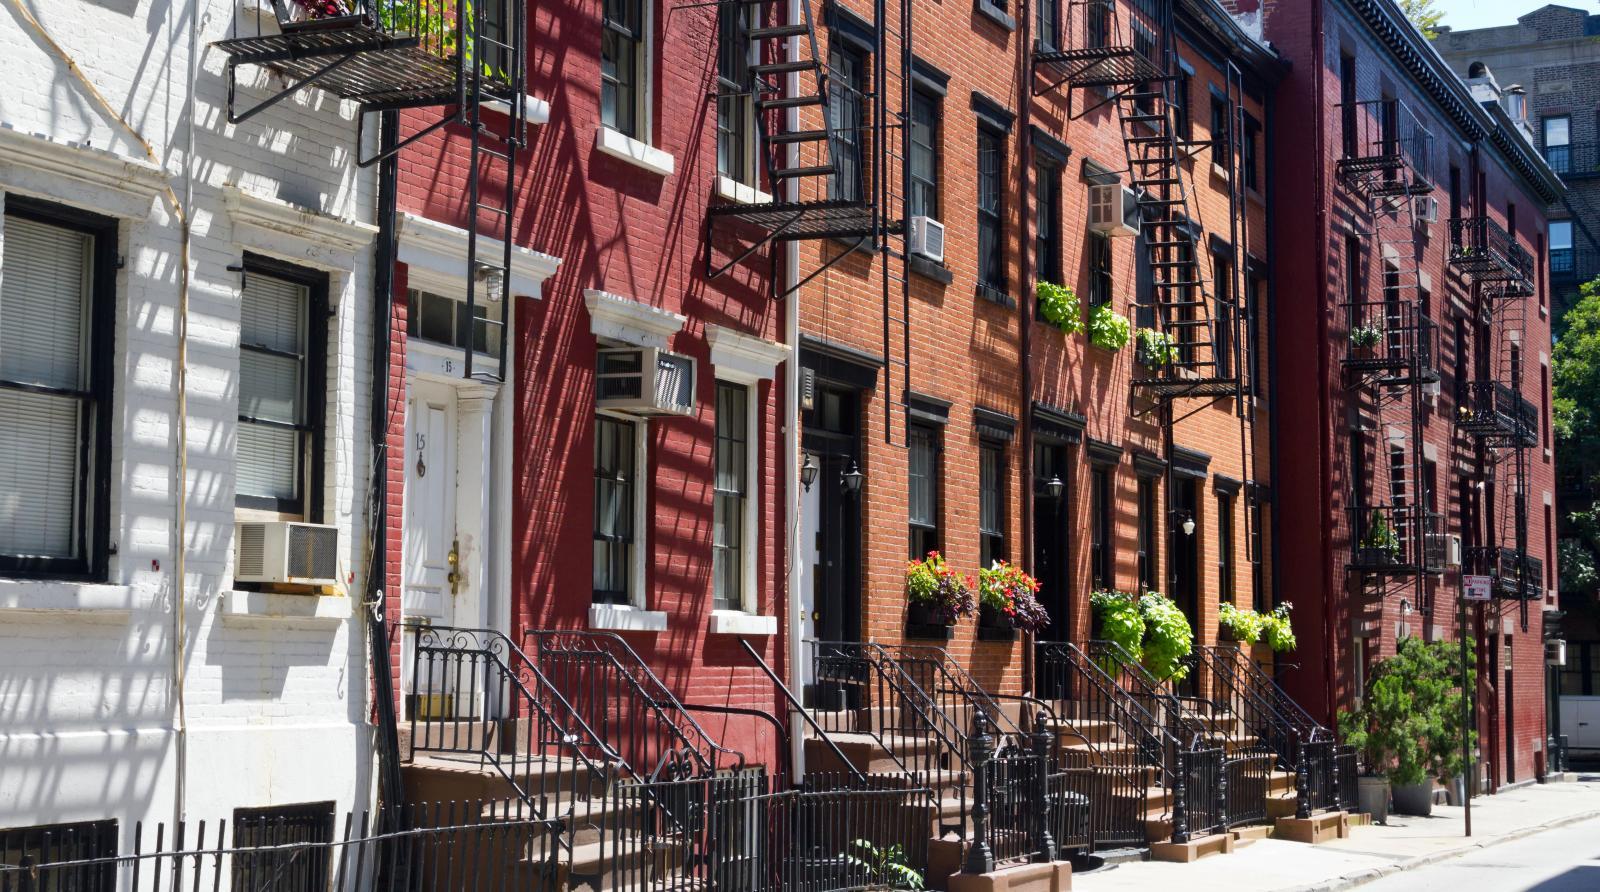 Houses on Gay Street, New York City